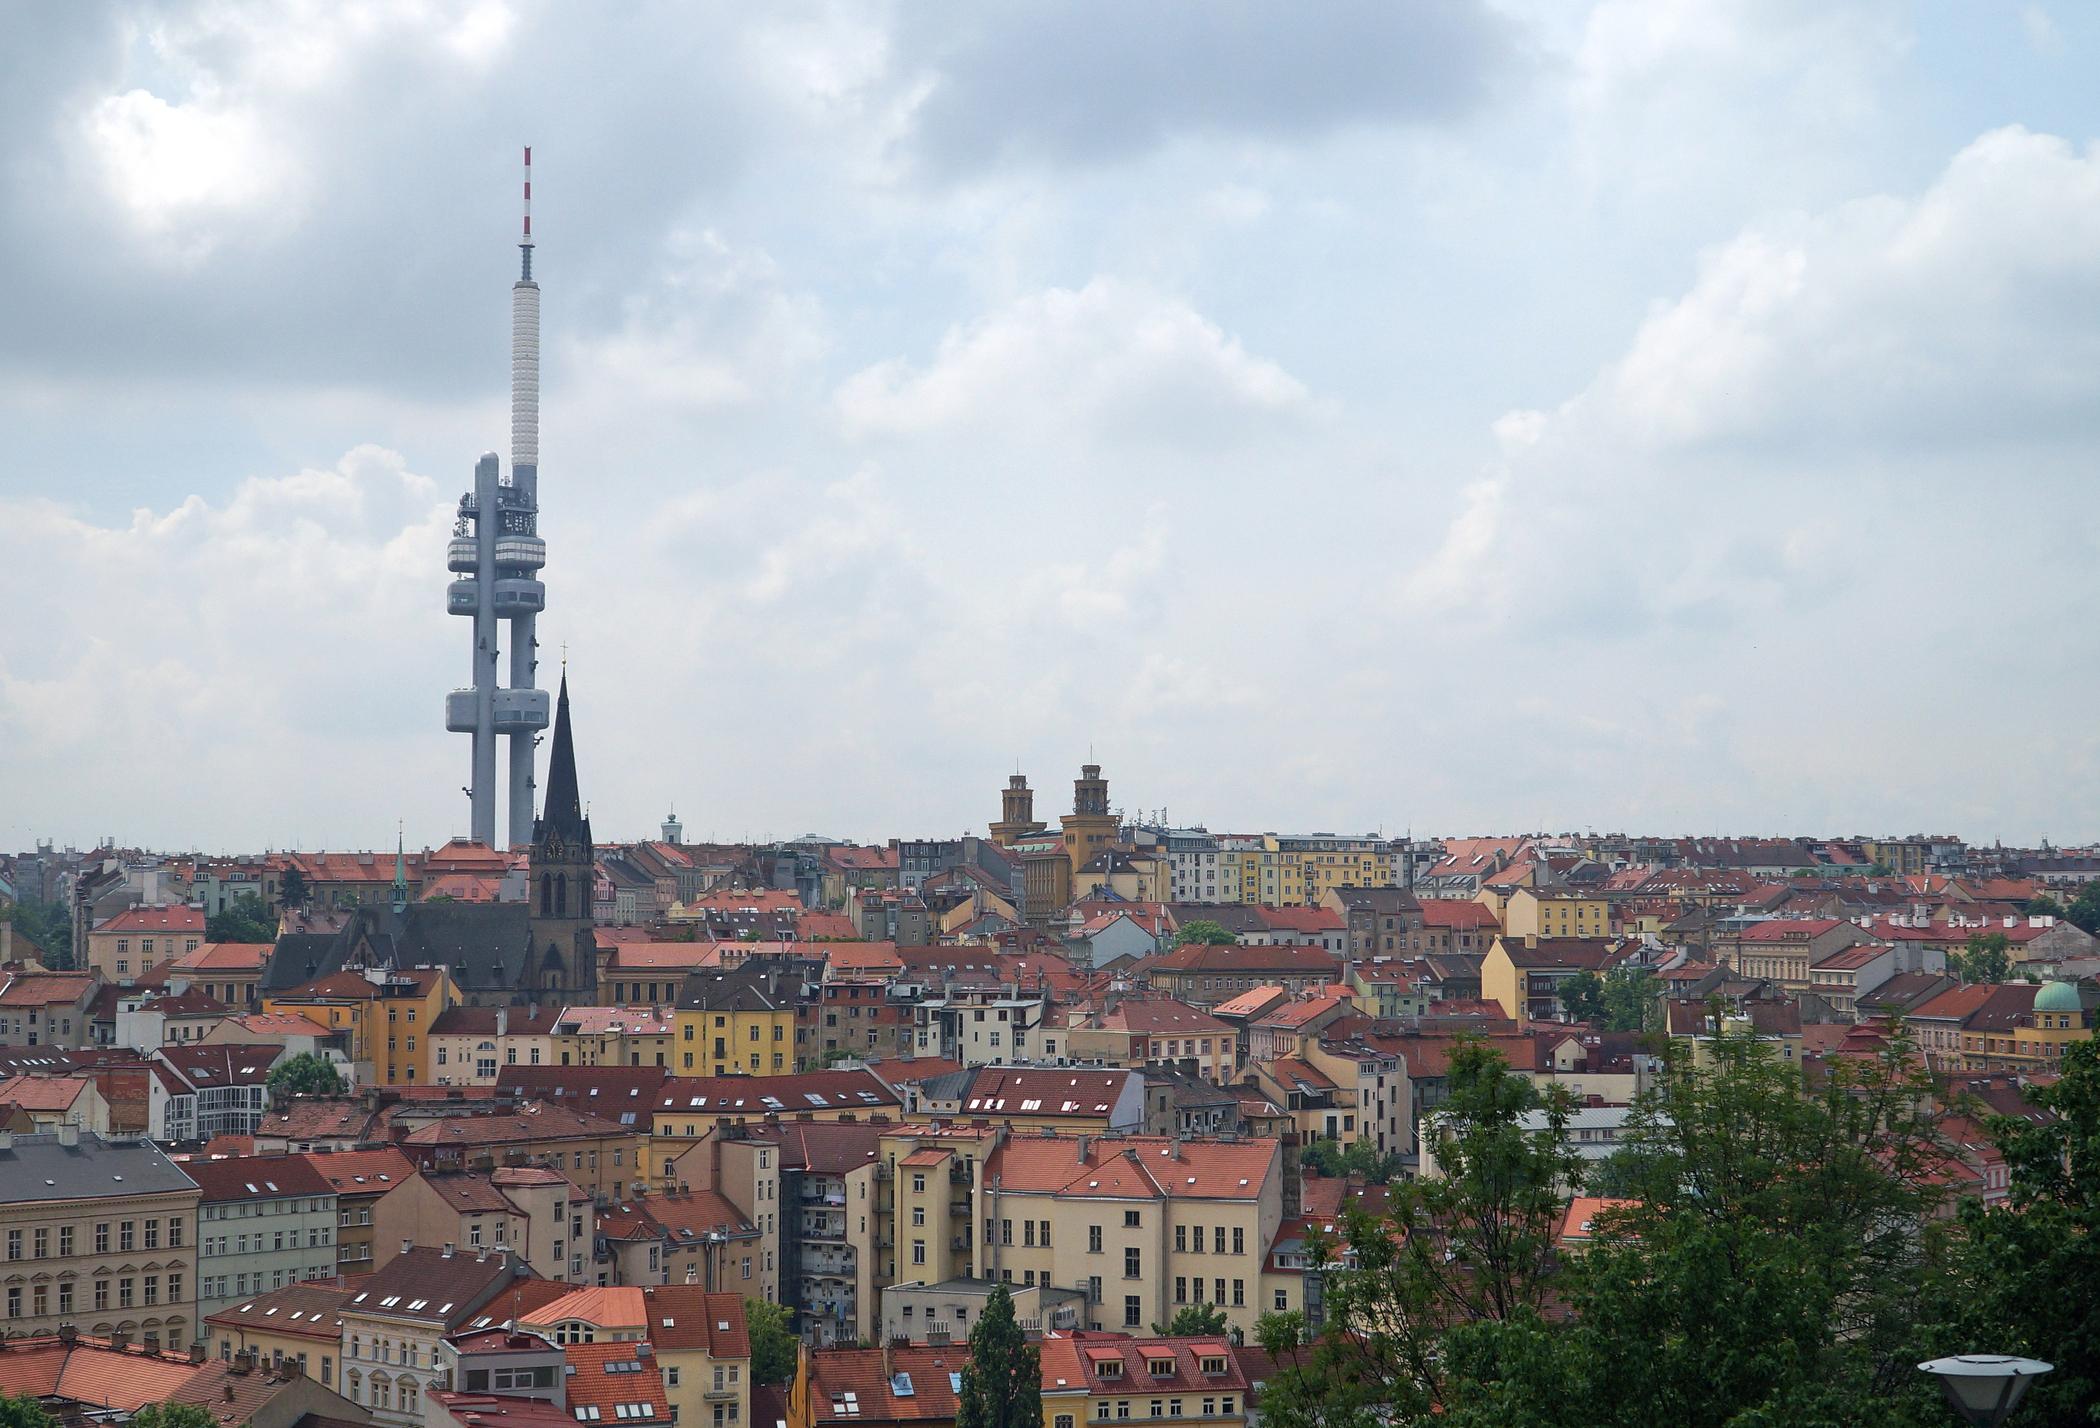 Zizkov TV Tower over Prague skyline.